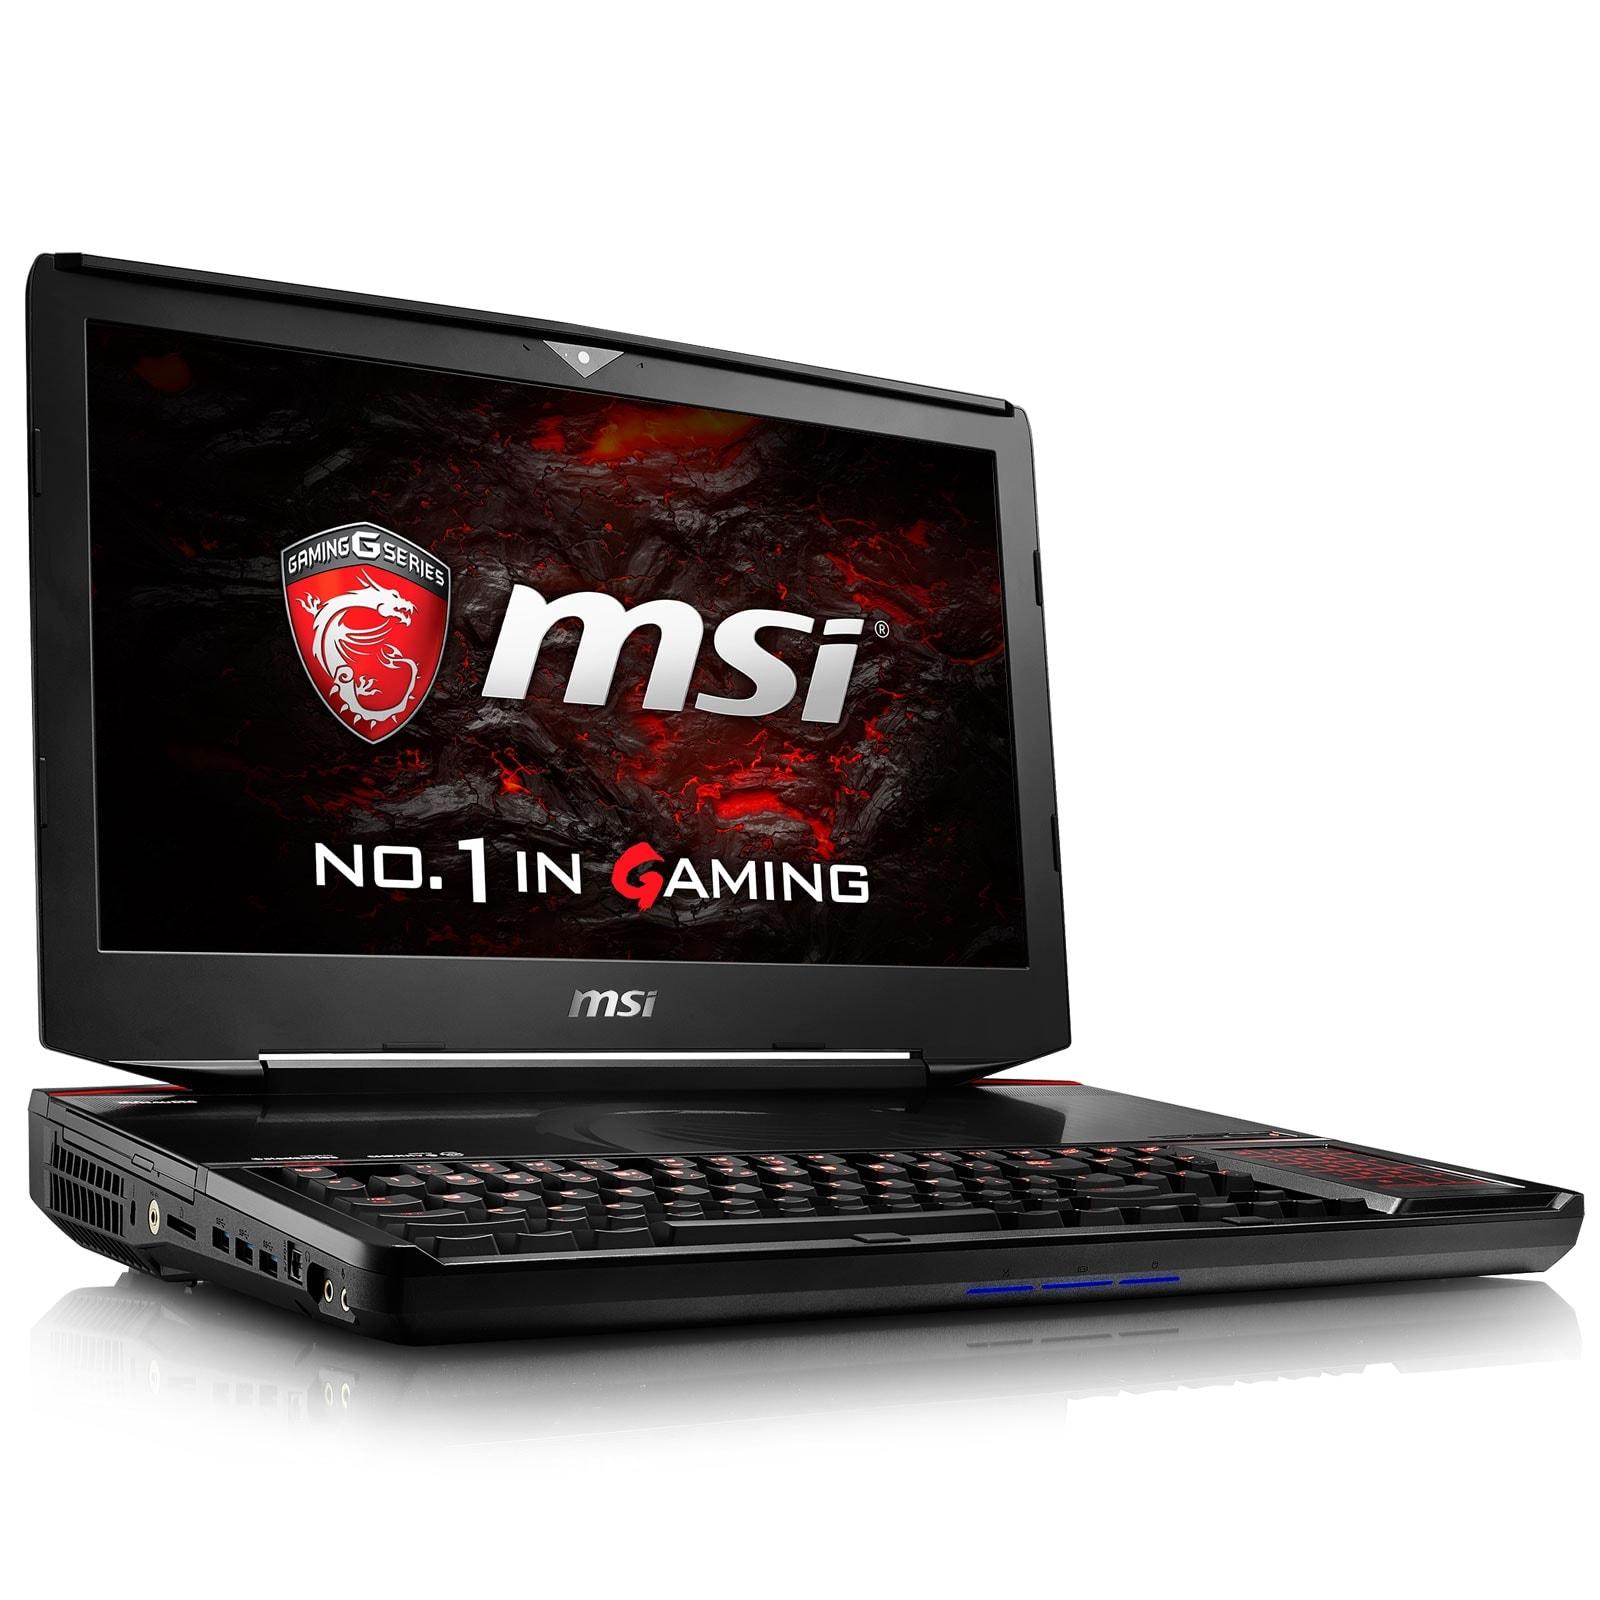 MSI GT83VR 6RF (Titan SLI)-037FR  (9S7-181512-037) - Achat / Vente PC portable sur Cybertek.fr - 0